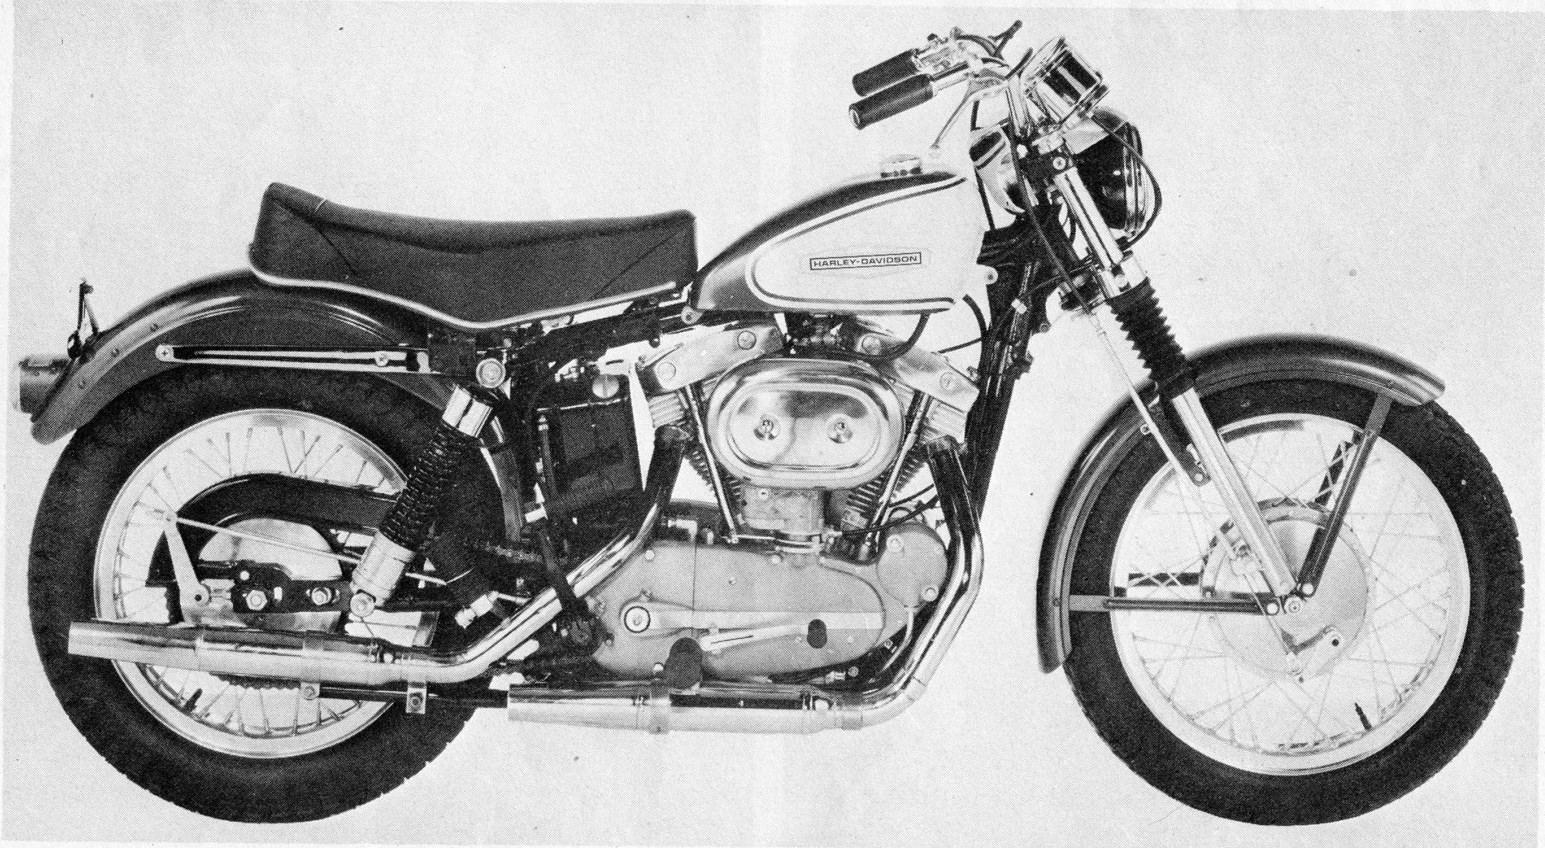 Modelo 66-XLCH Sportster